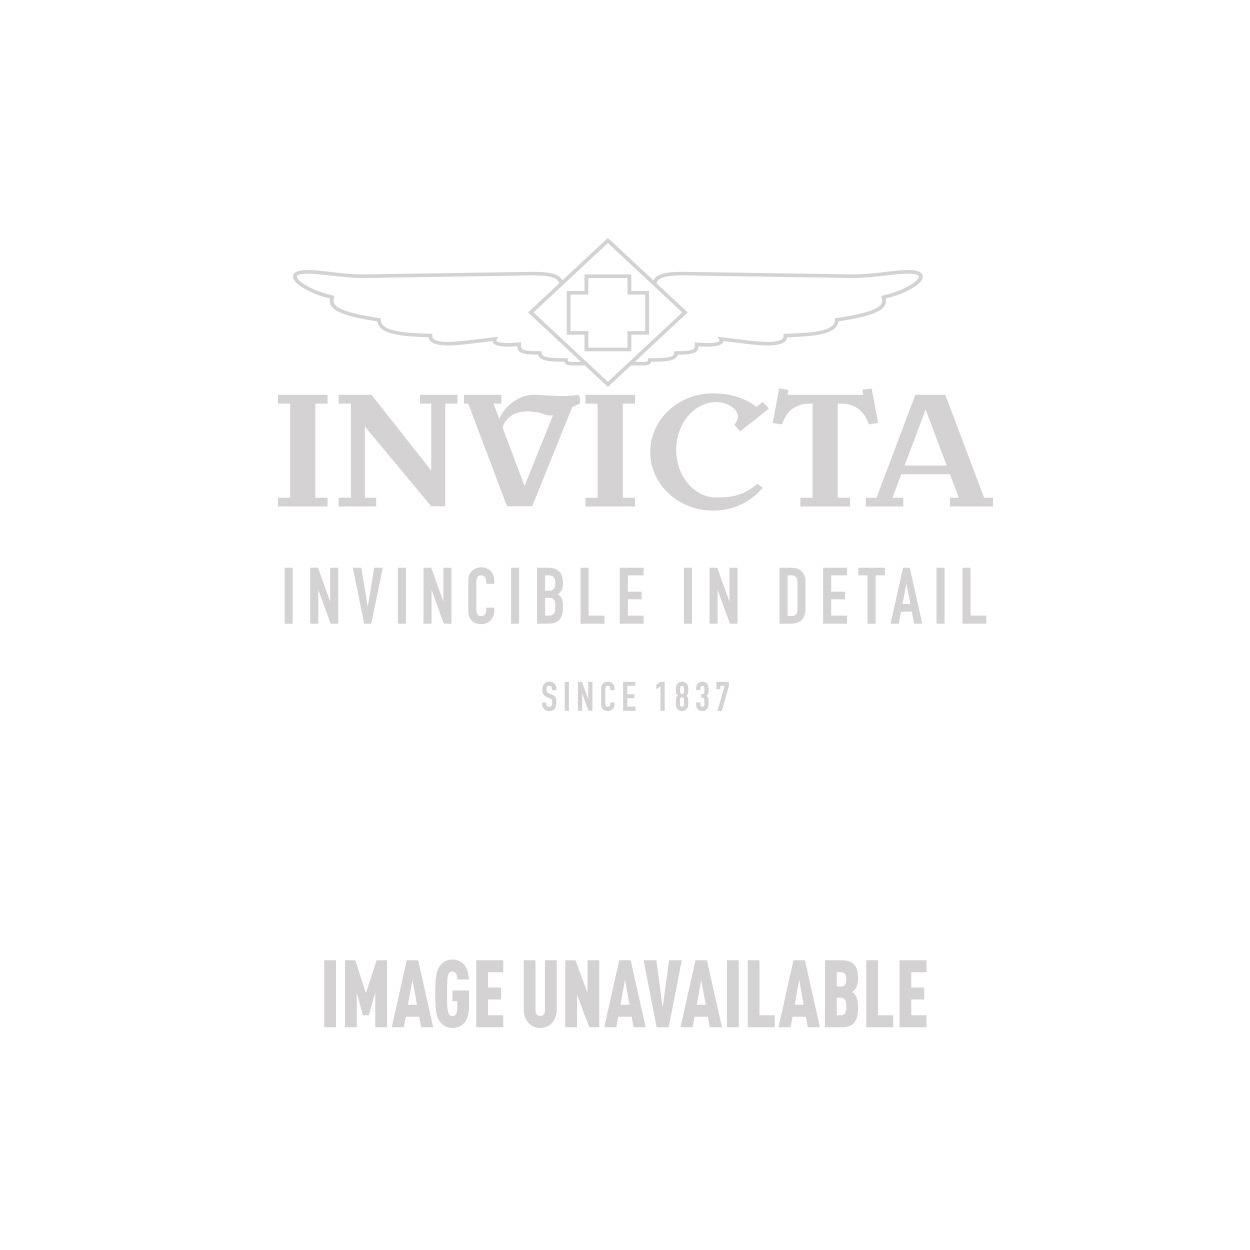 Invicta Subaqua Swiss Made Quartz Watch - Blue case with Black tone Artificial Rubber band - Model 12881